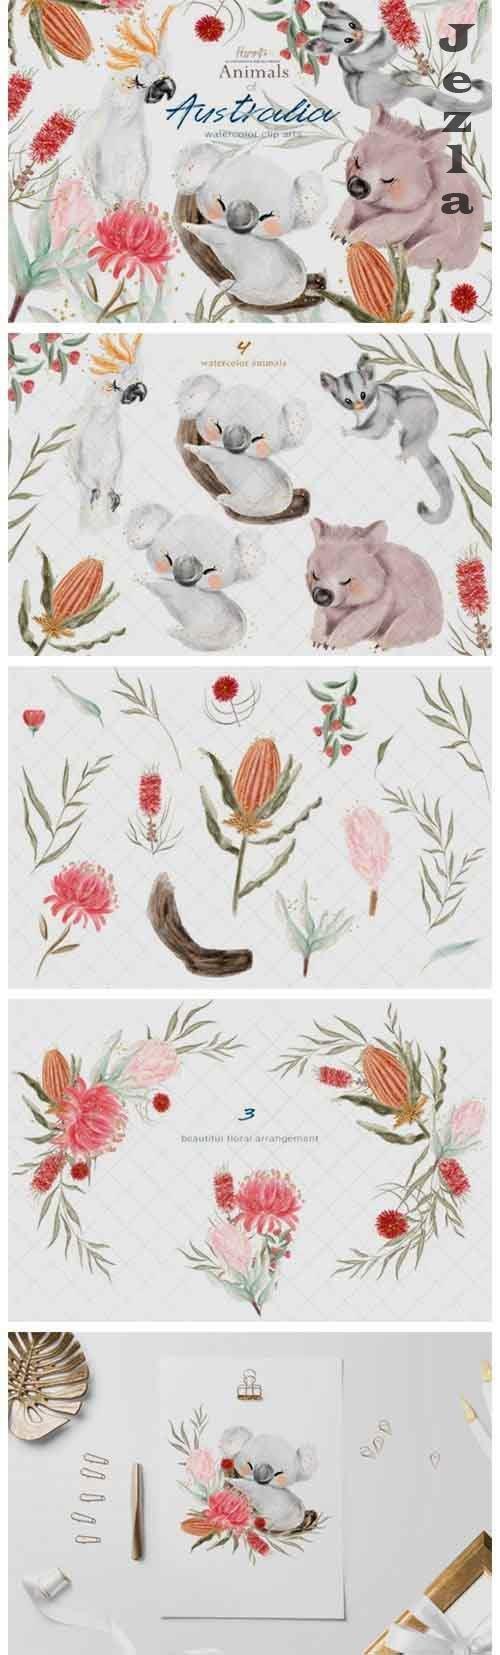 Watercolor Australian animals illustration - 905921